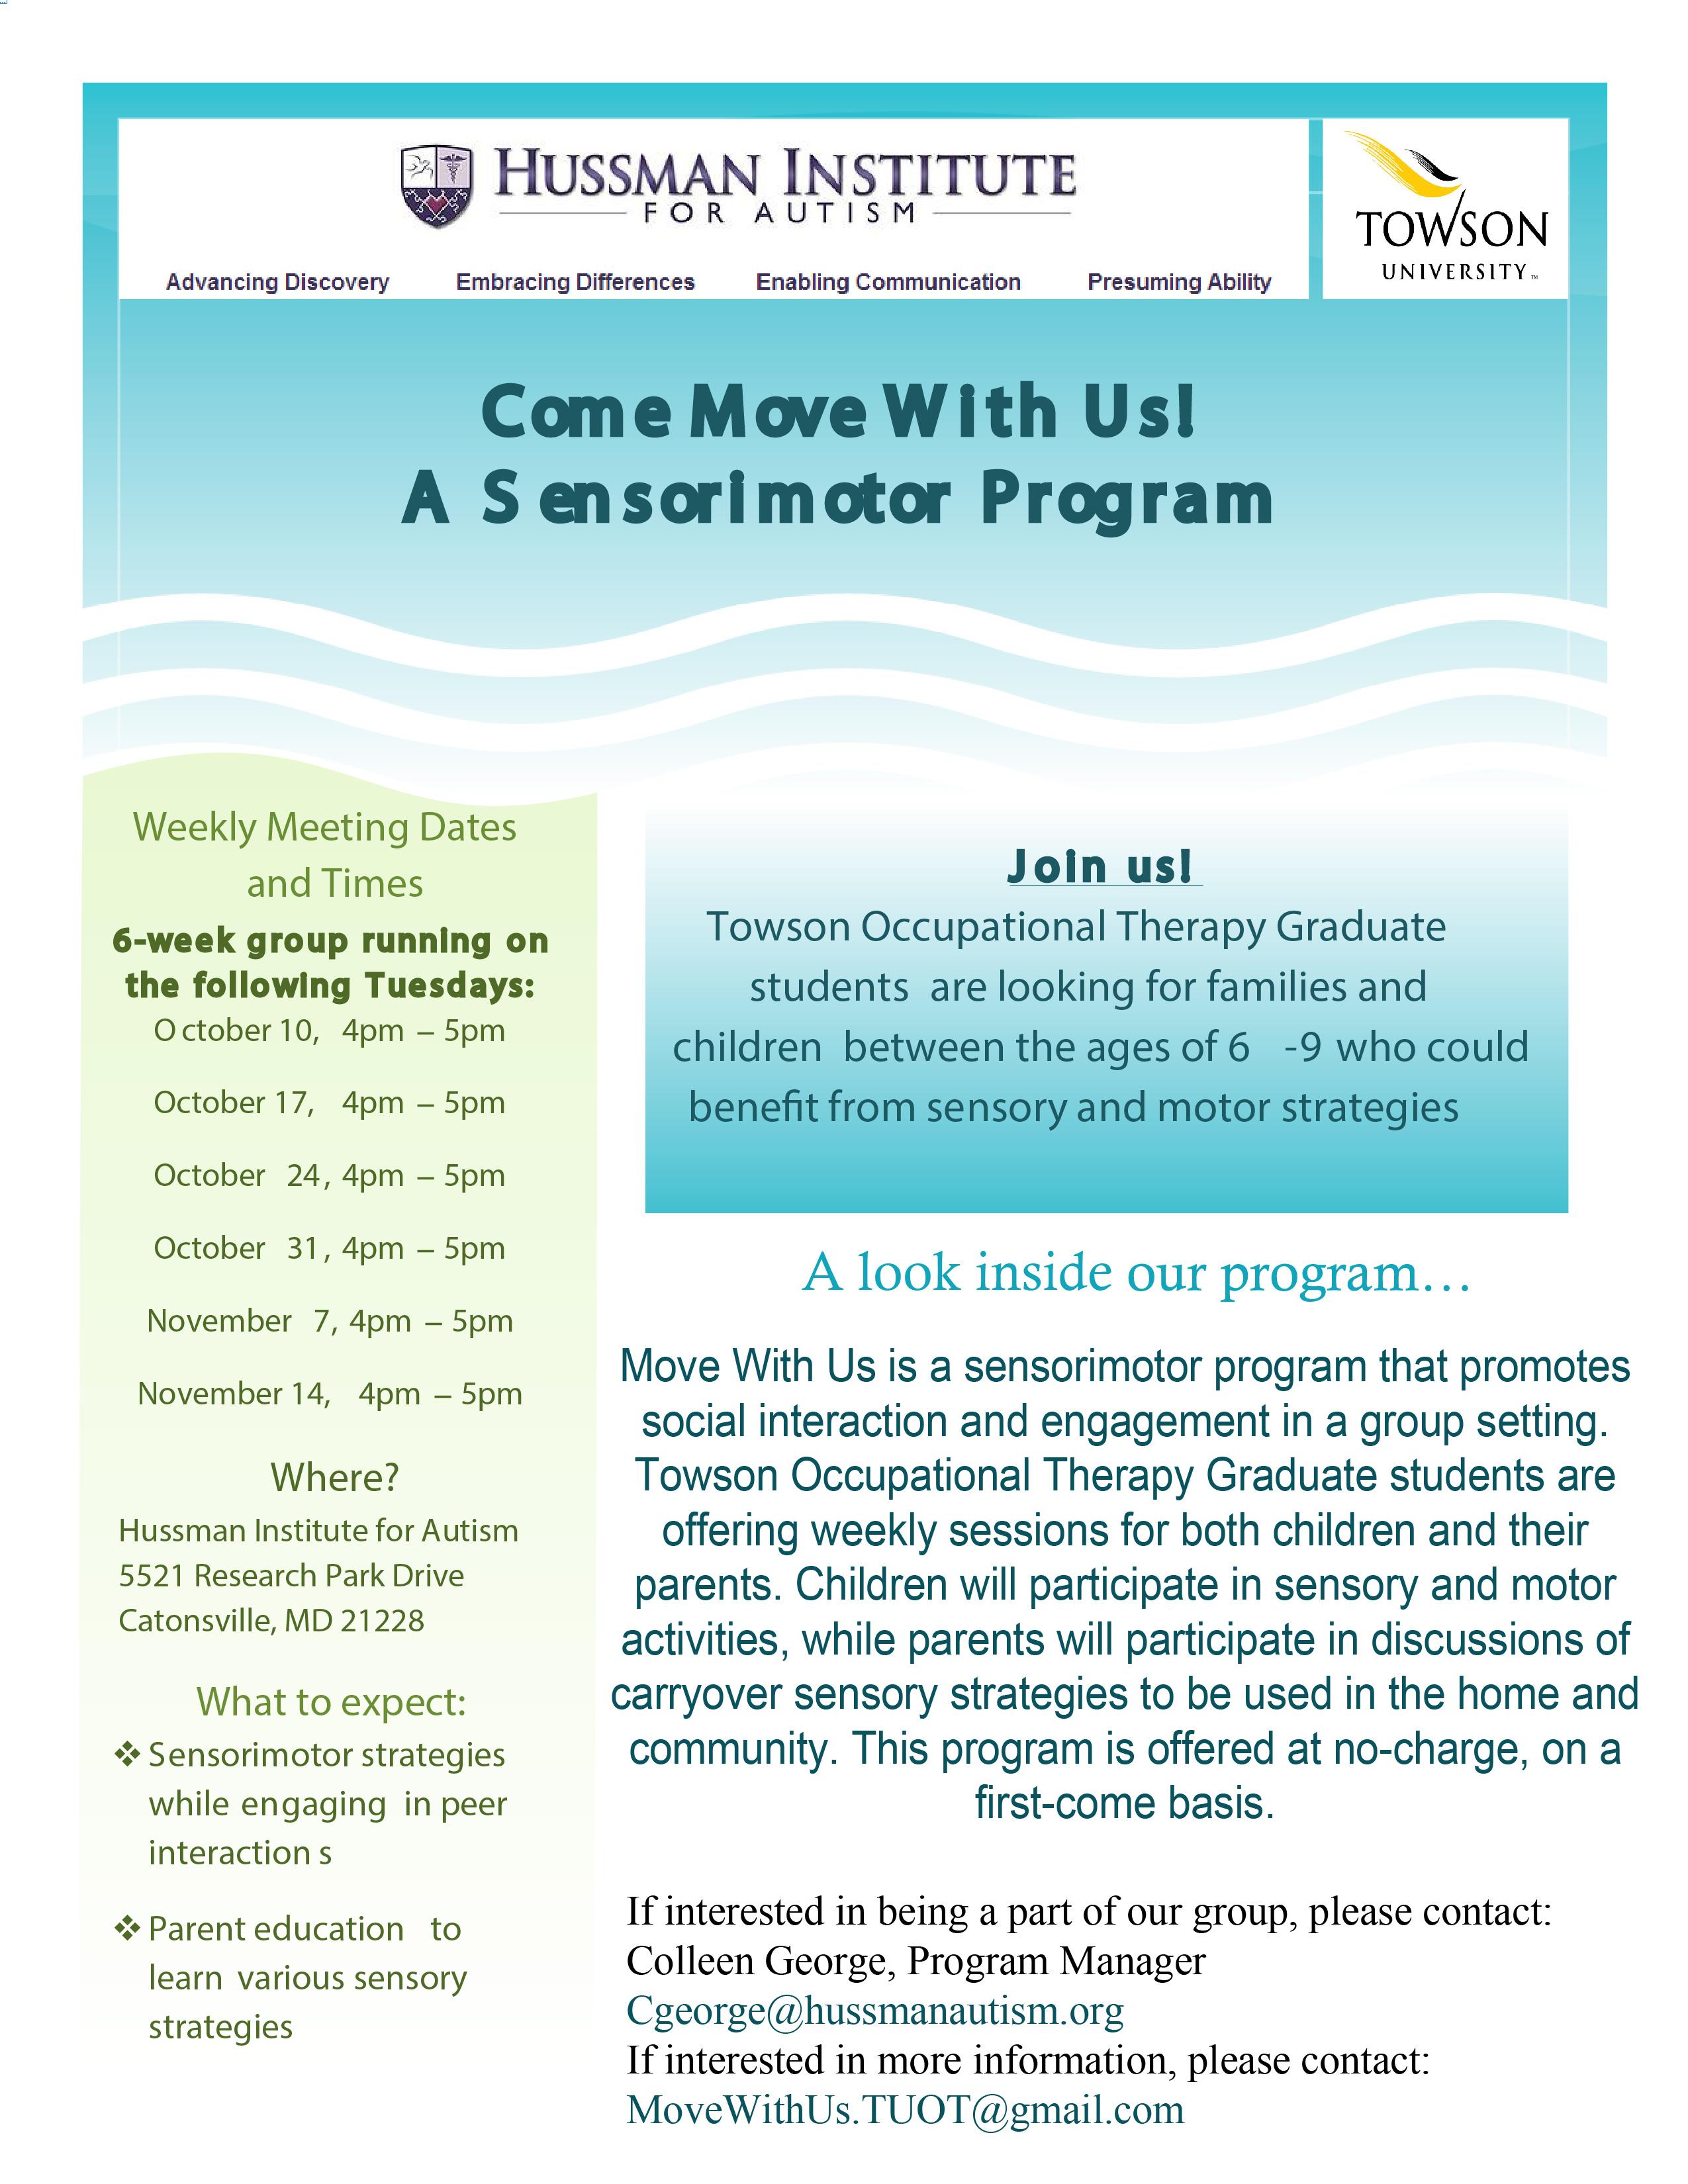 Move With Us Sensorimotor Program Flyer-01